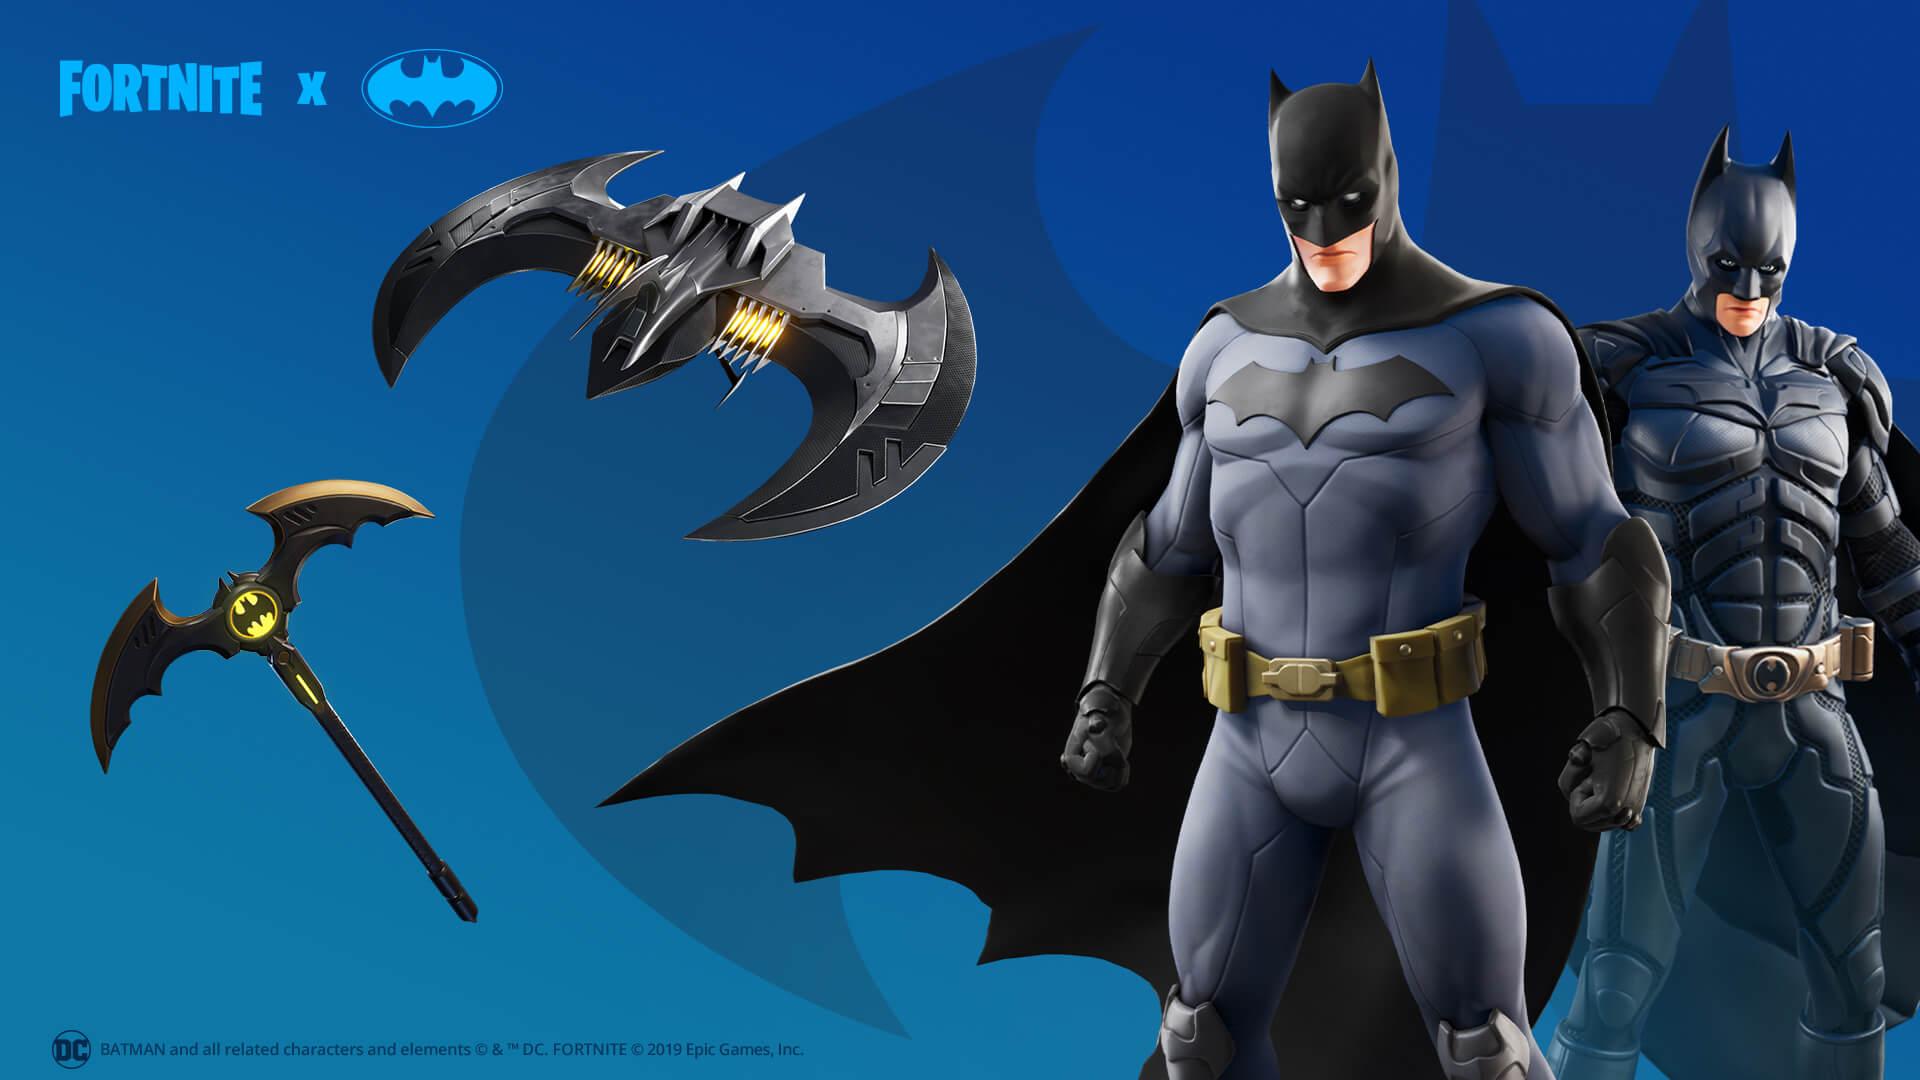 Fortnite X Batman_01